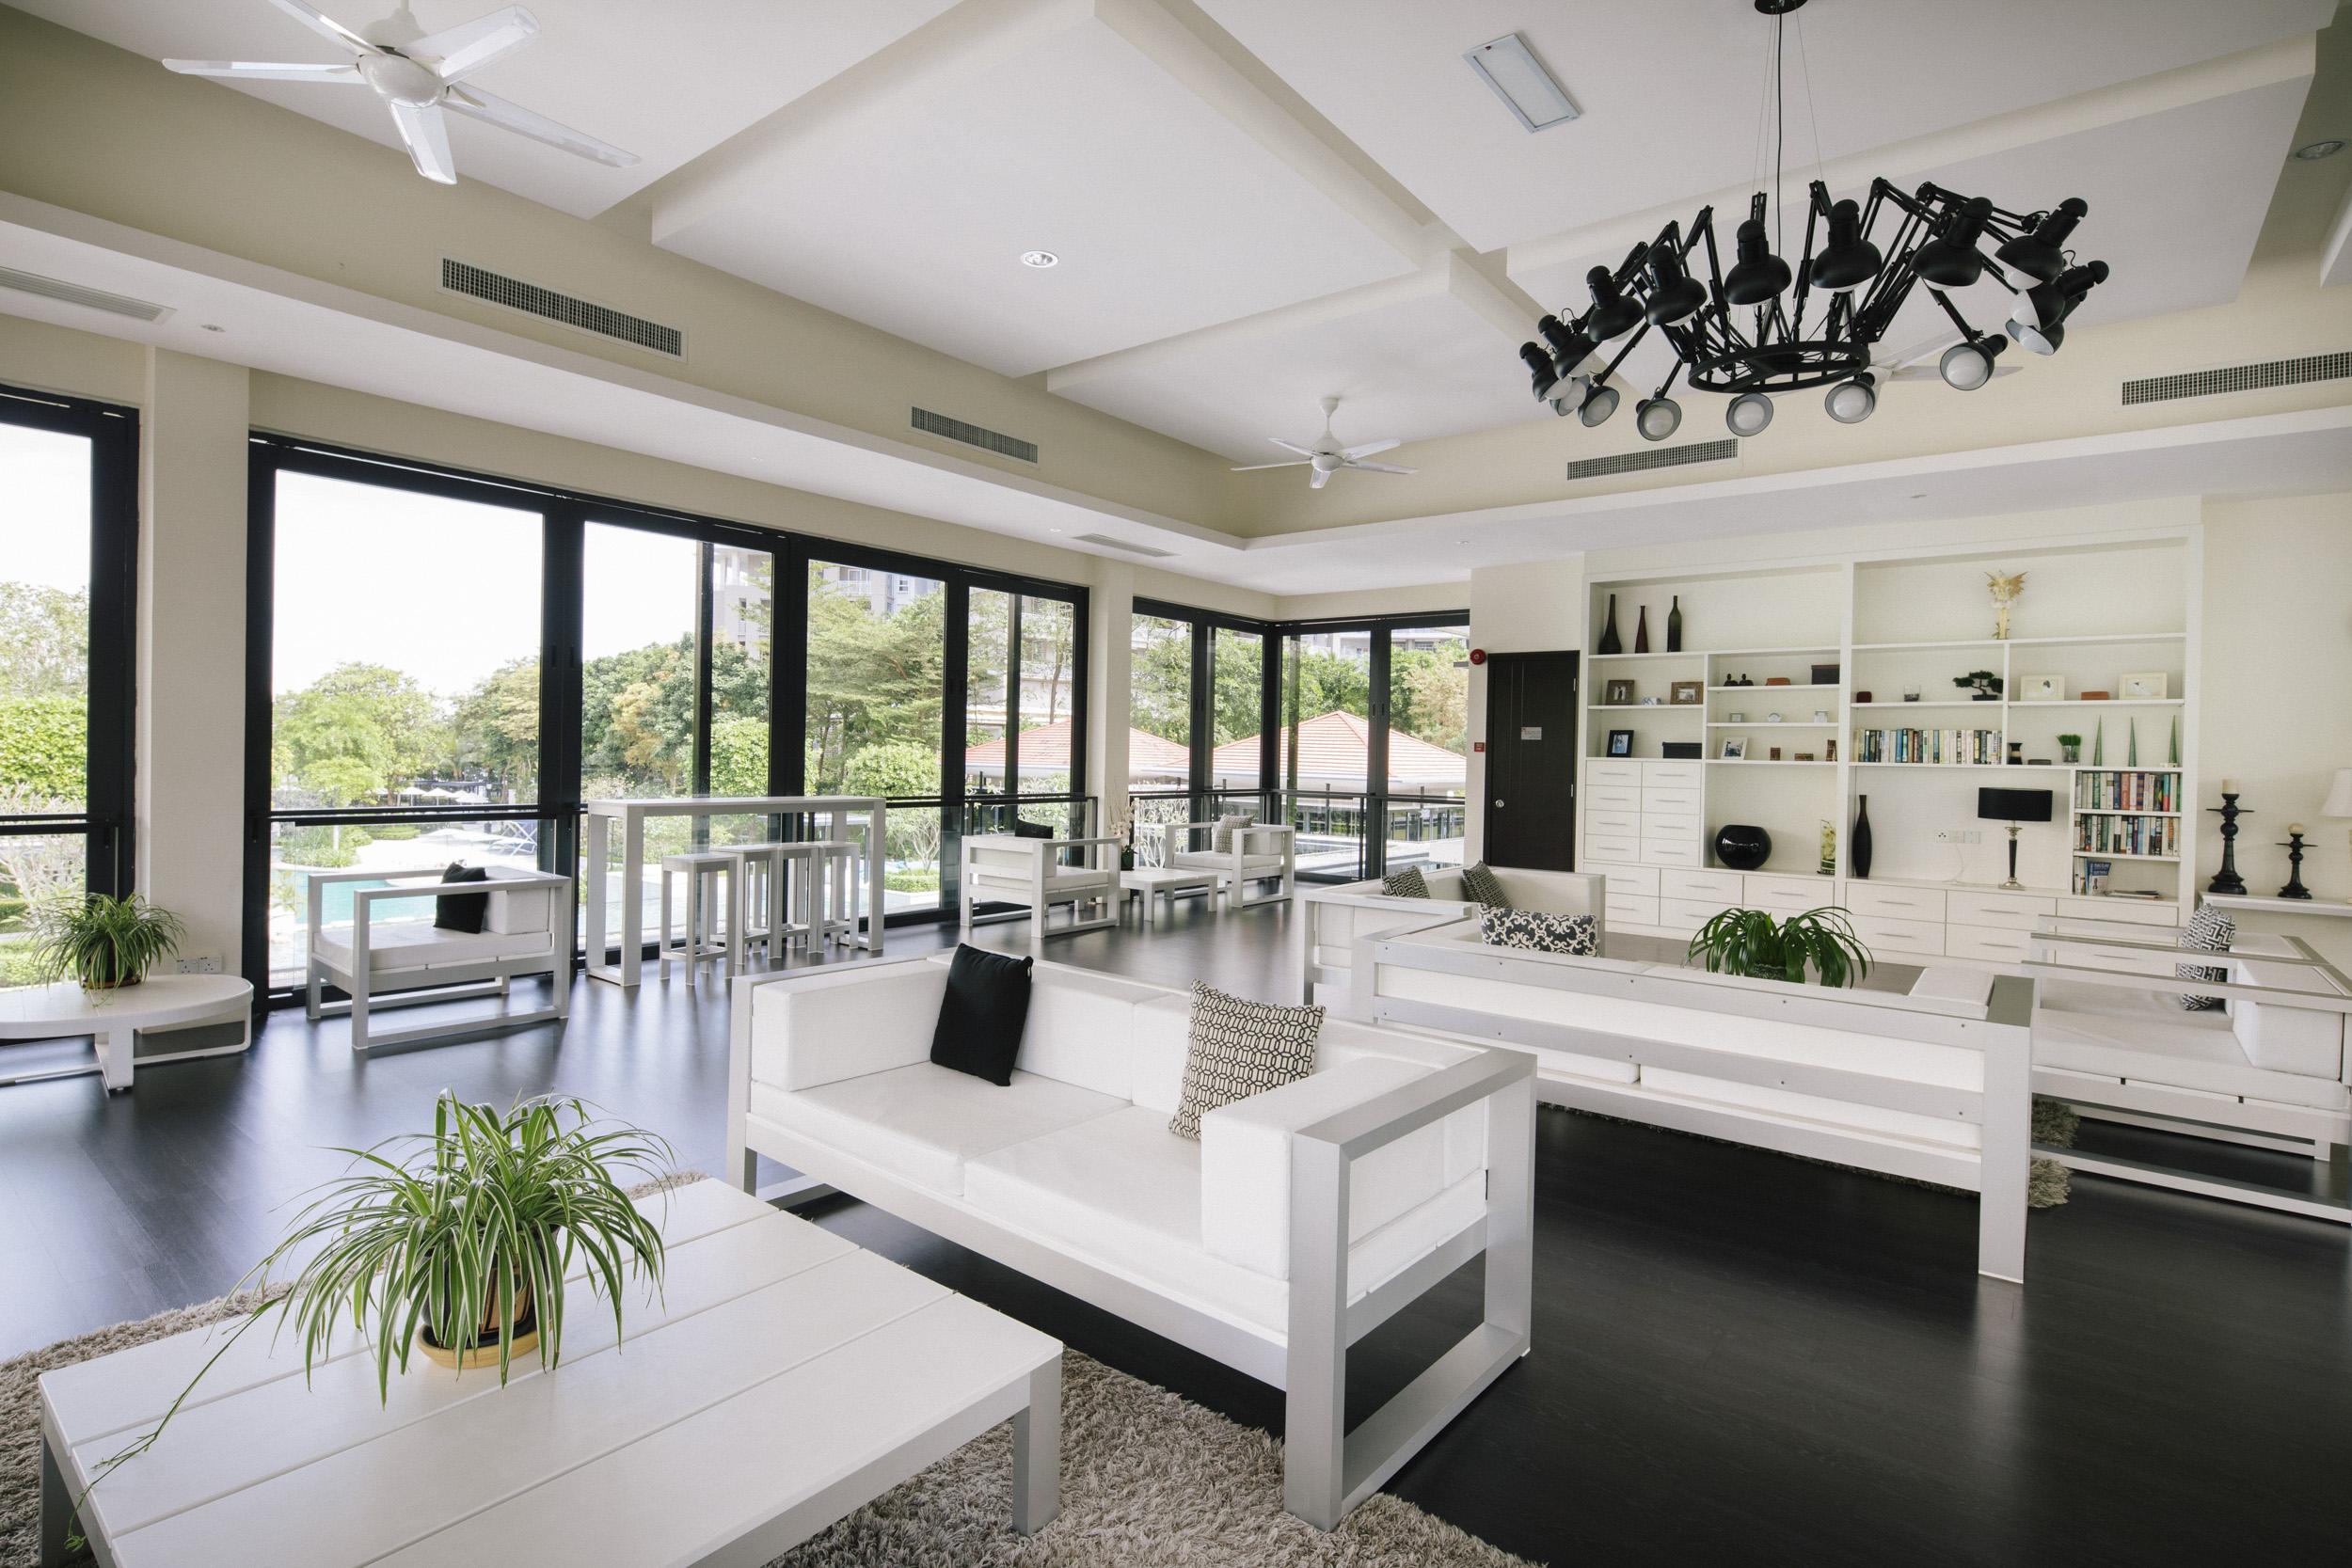 architecture_photography_sydney_australia_40.jpg